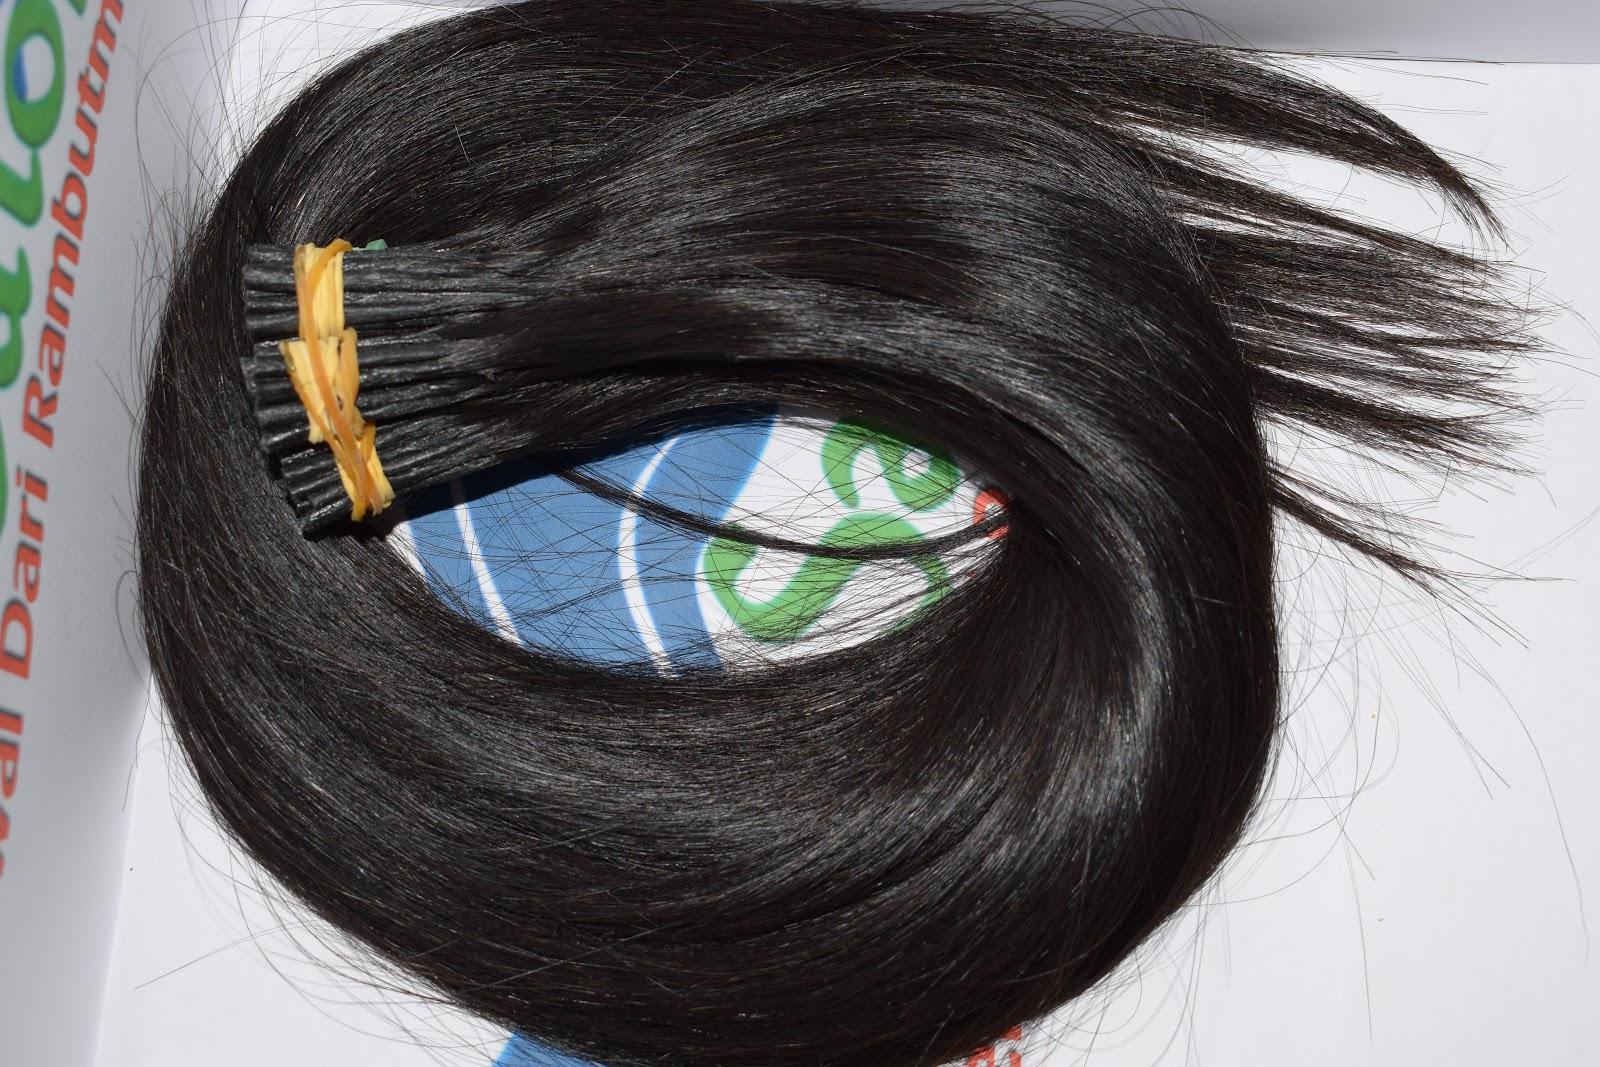 Cara Memasang Rambut Gimbal Sambungan Sariayyu Sambung Plus Smoothing Dan Diwarnai Harga Berbagai Ukuran 2018 Daniico Salon Jual